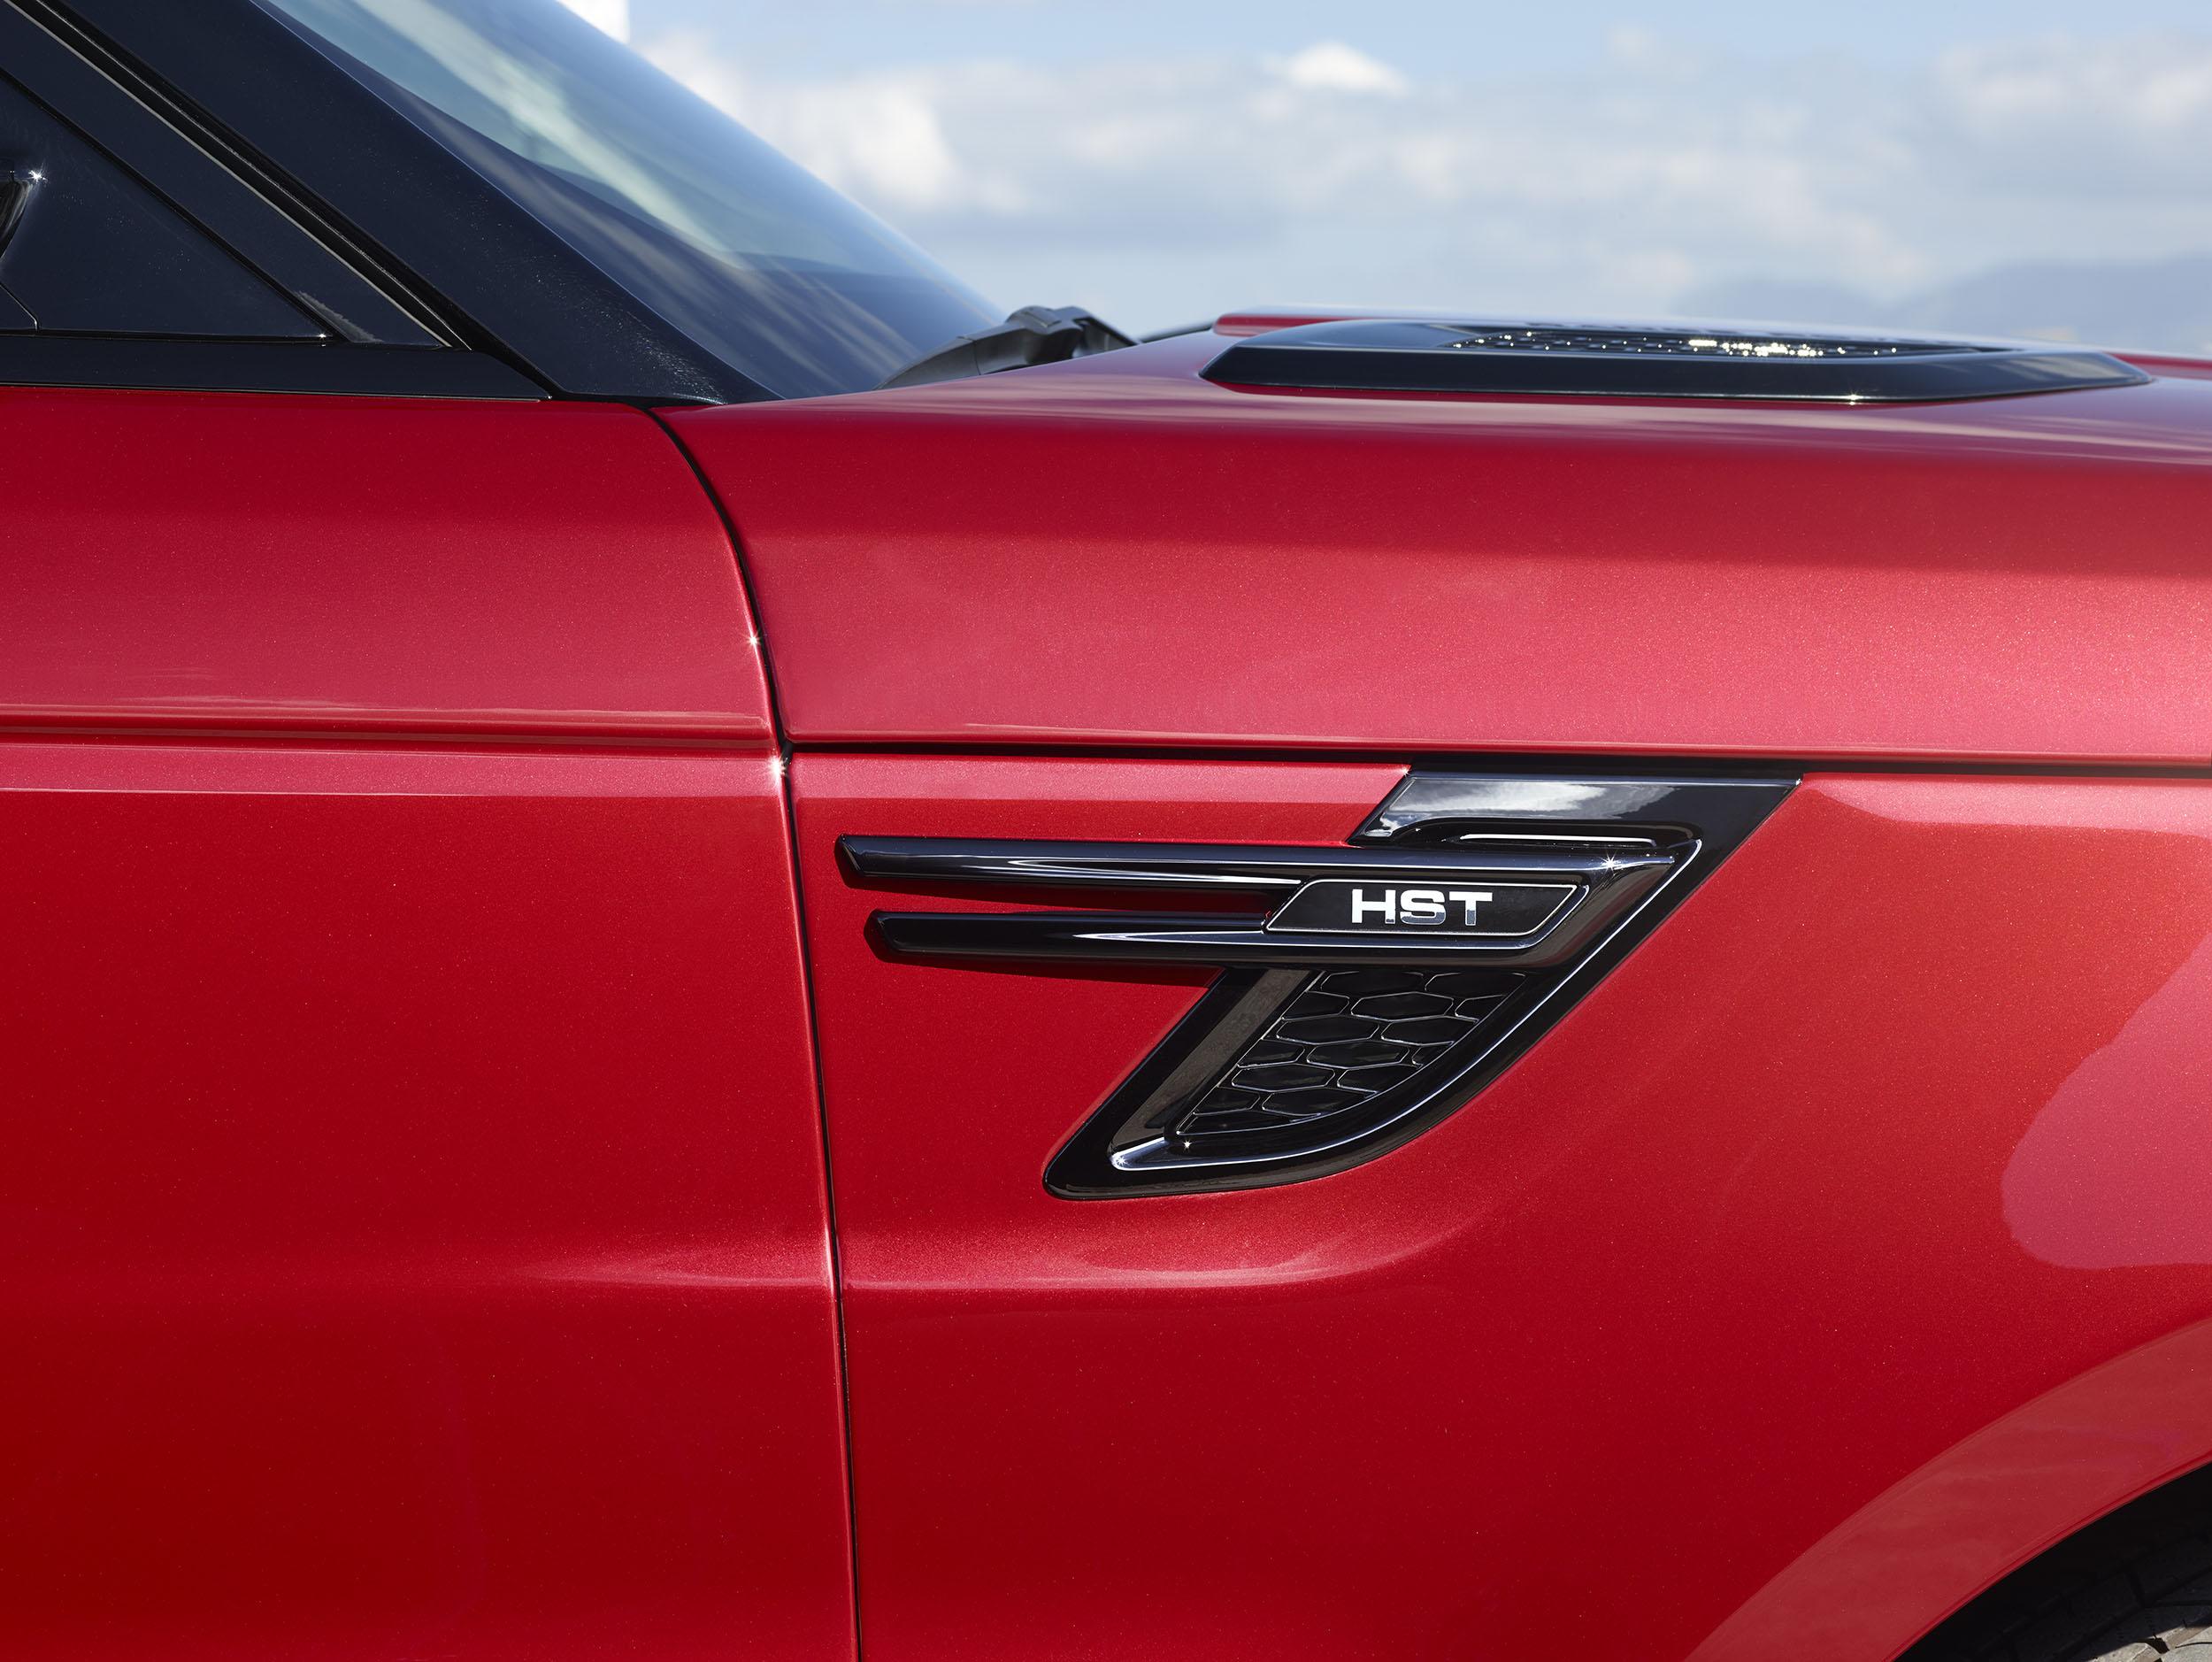 2016 Range Rover Sport HST - Picture 119126